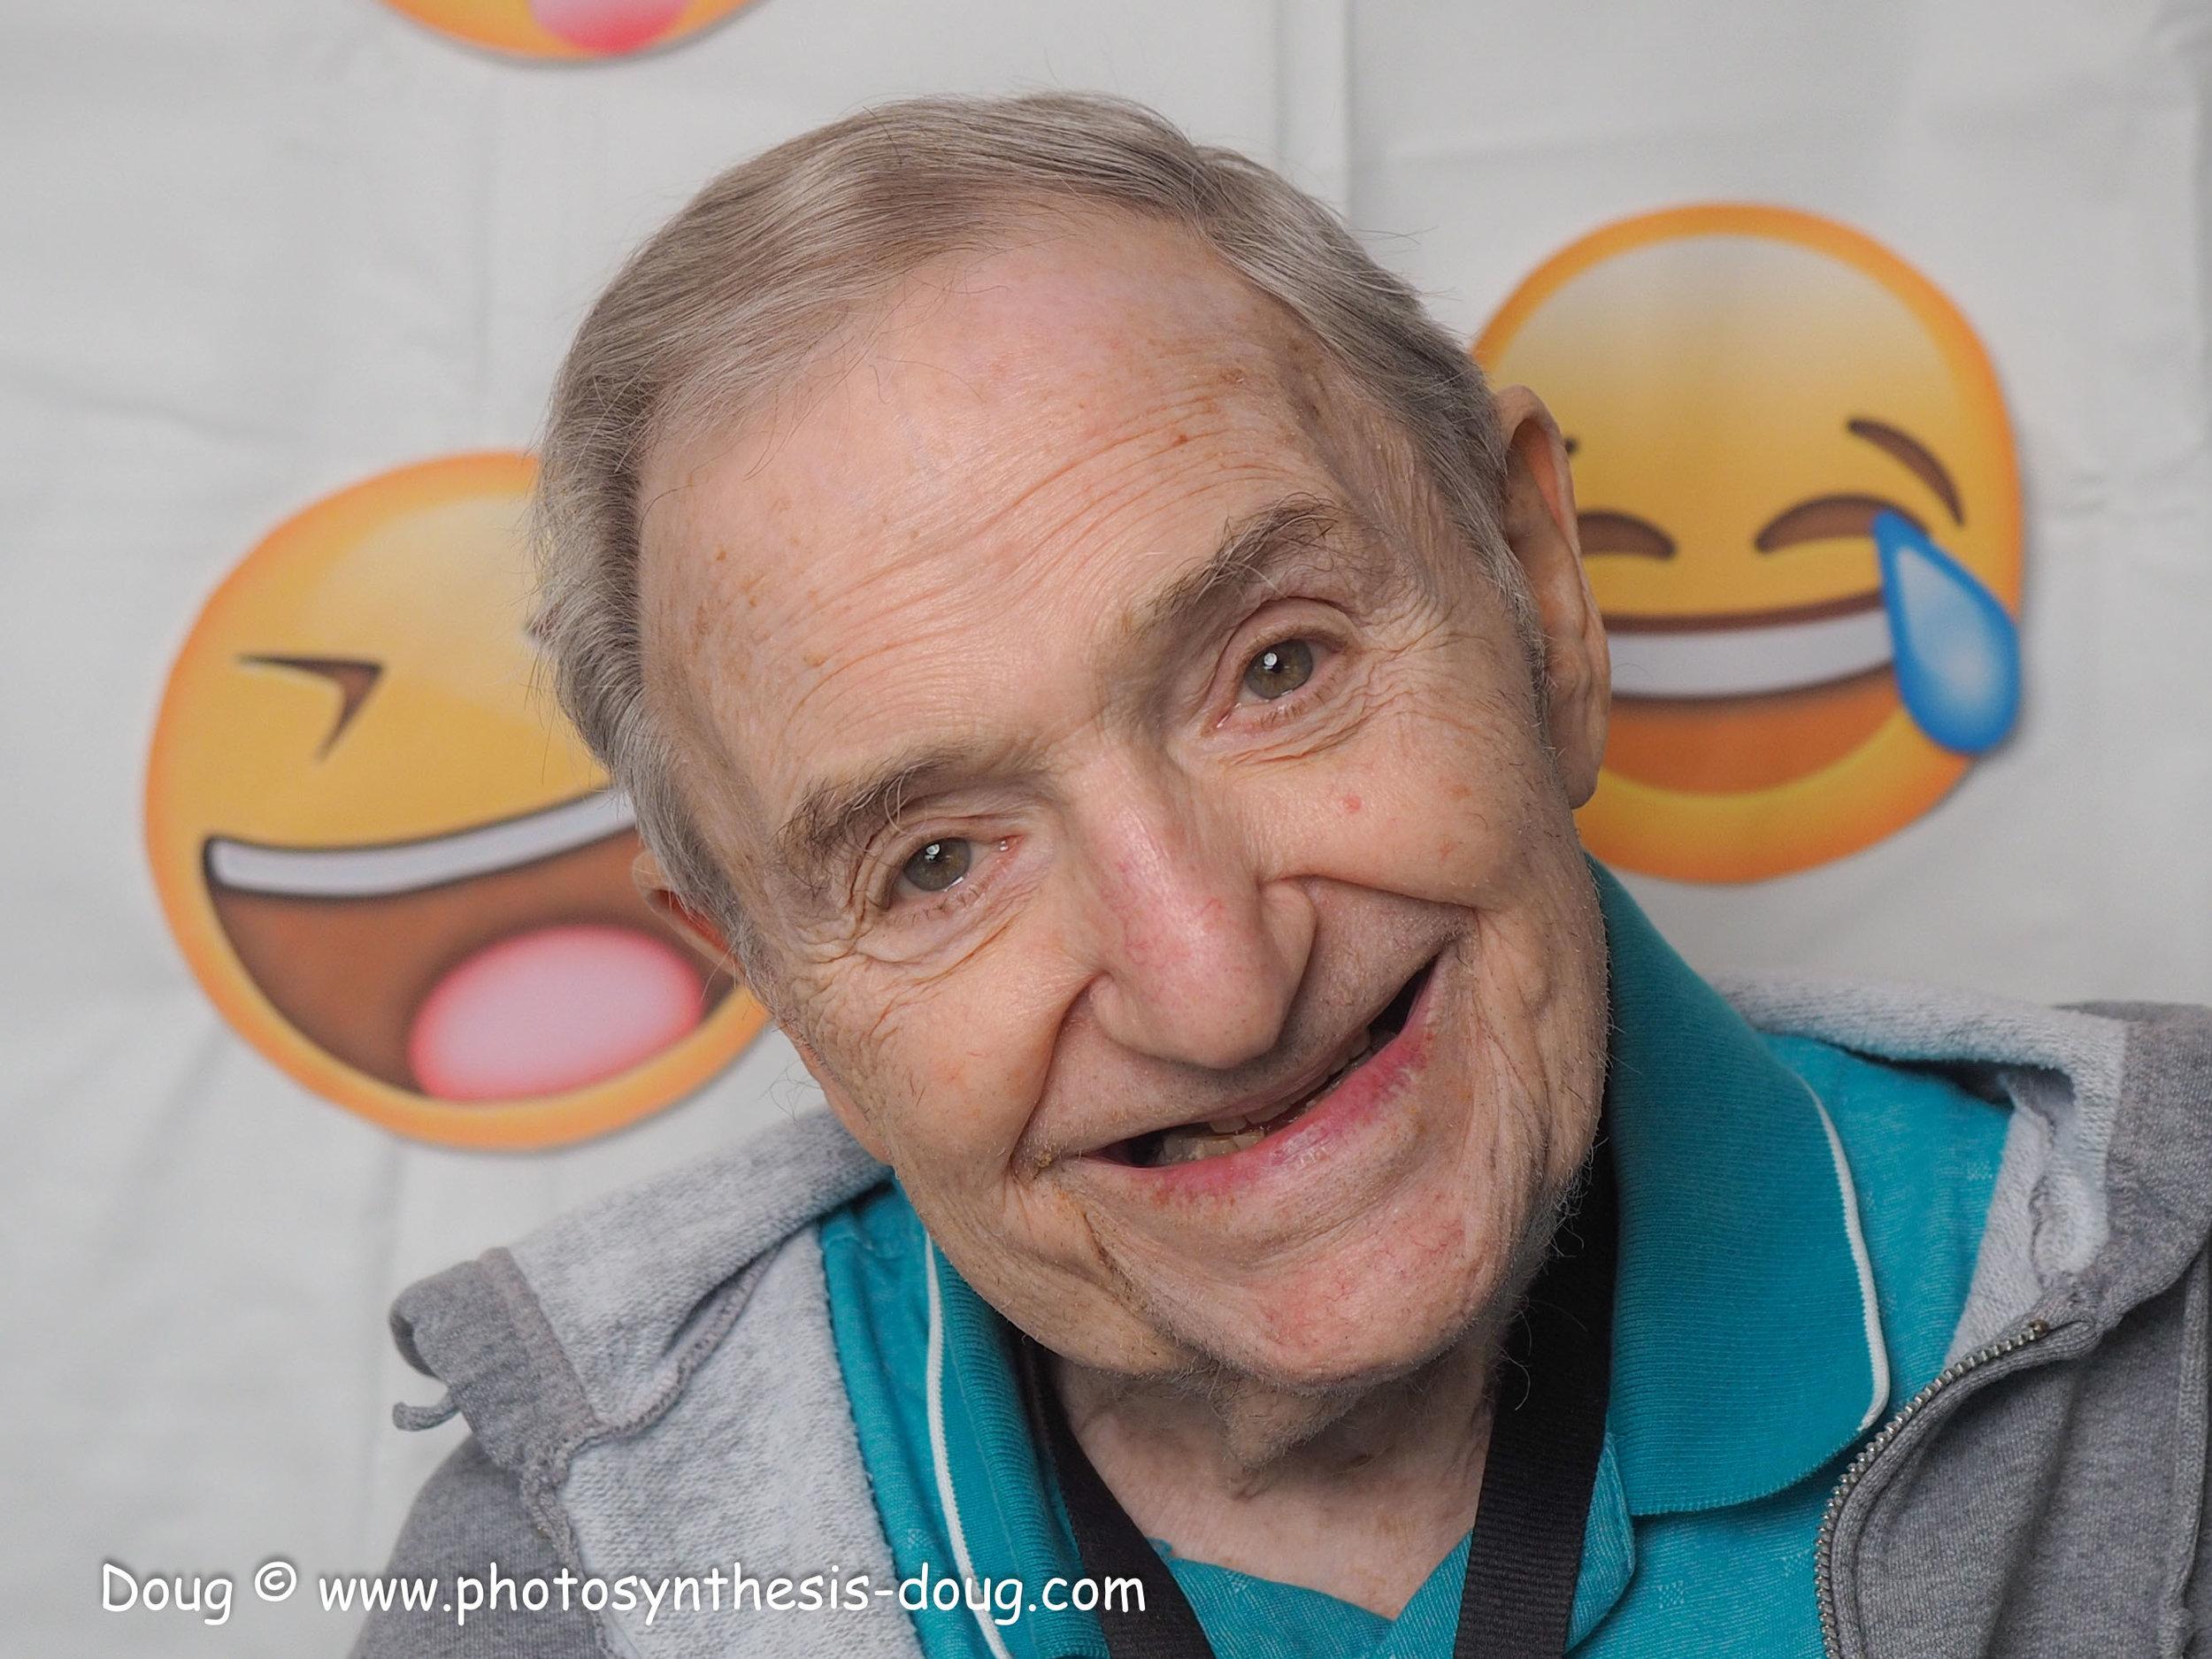 assisted living portrait-4240069.JPG